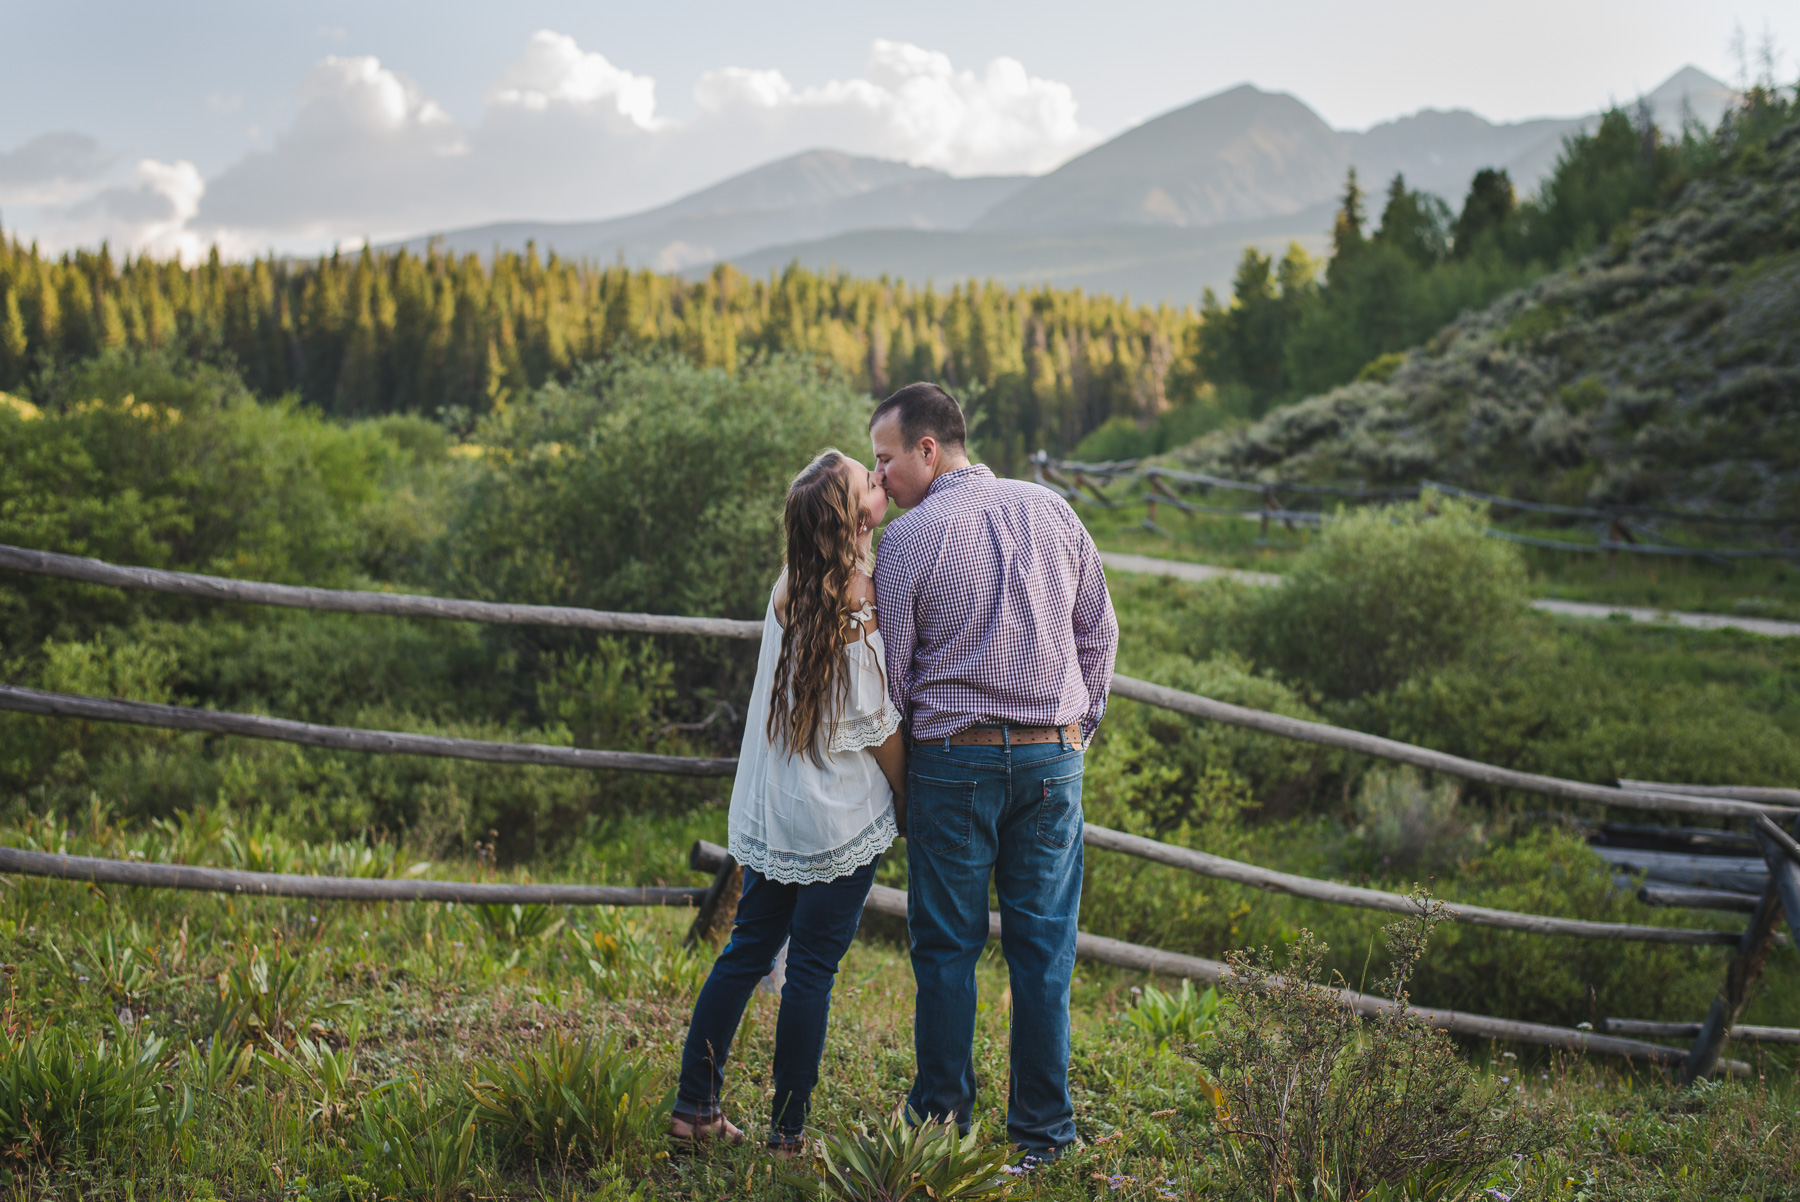 summer destination anniversary and honeymoon portraits in colorado rocky mountains | summit mountain weddings